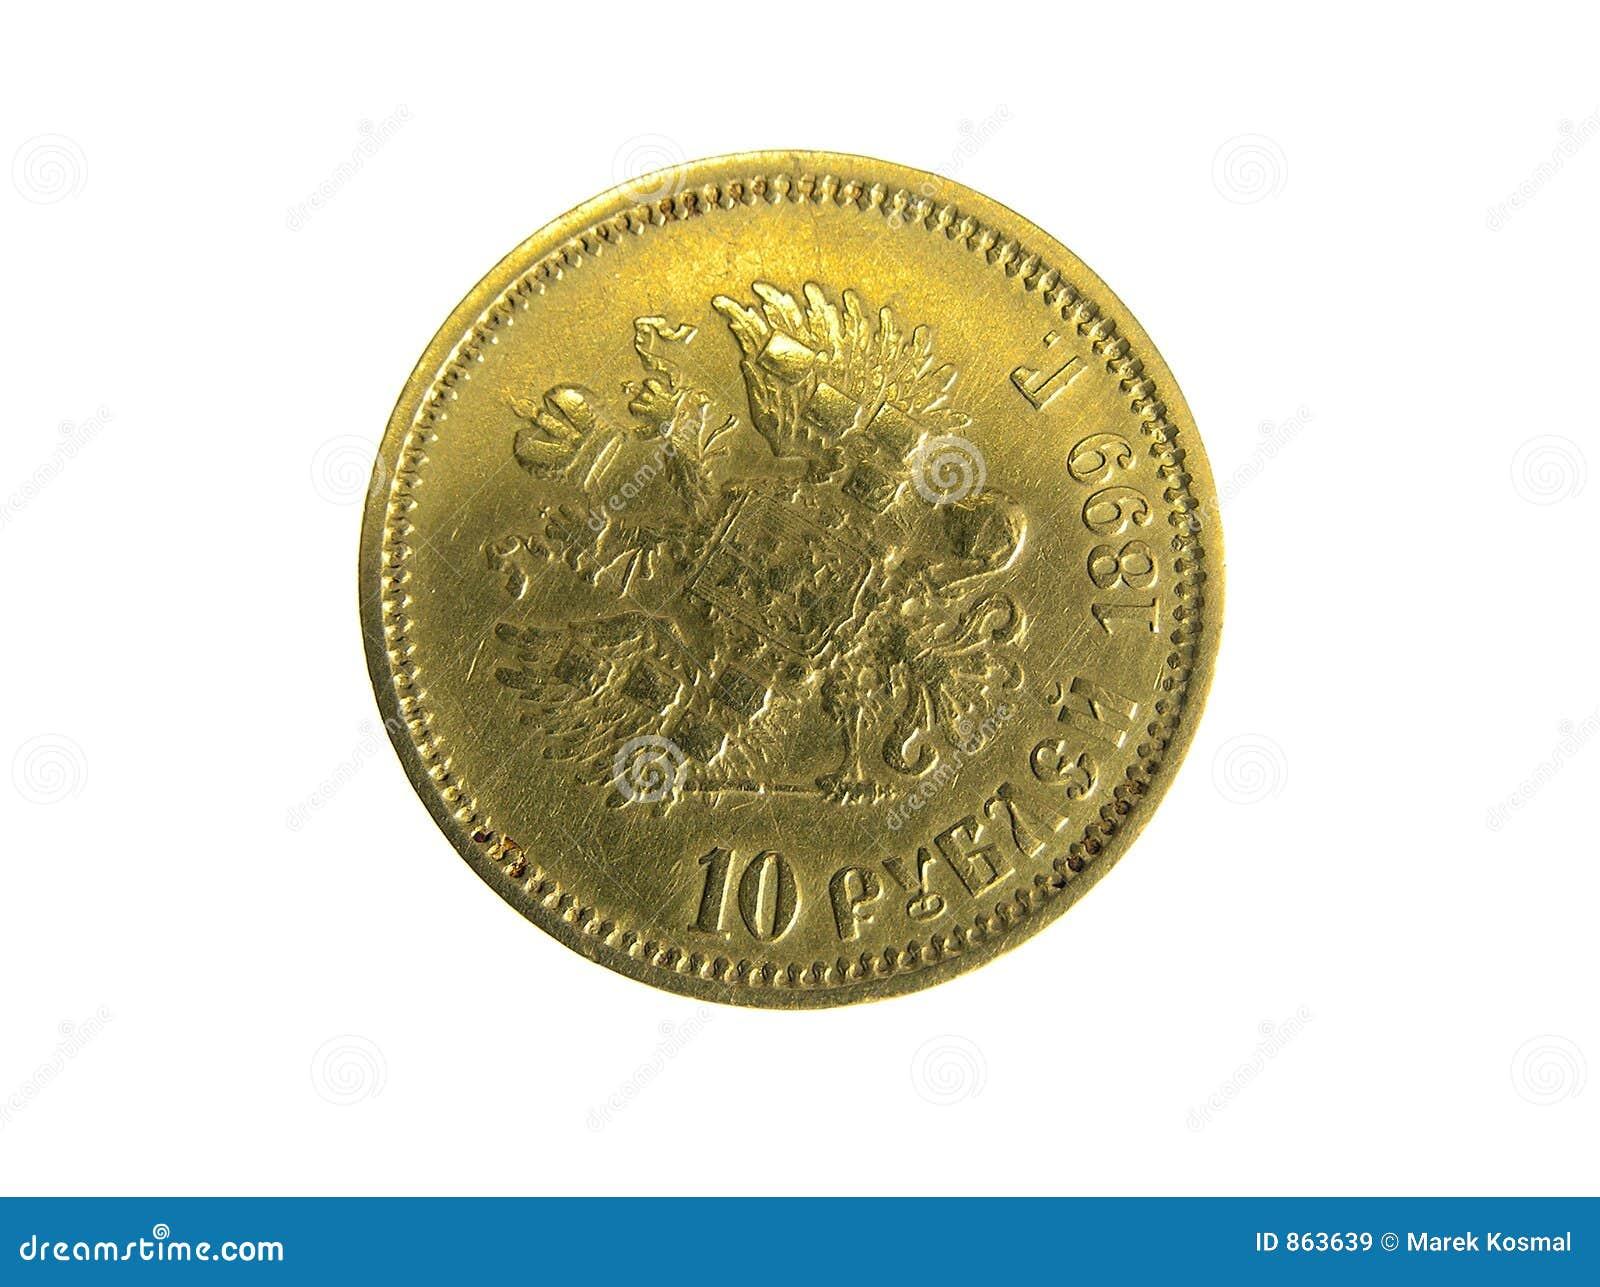 Golden roubles